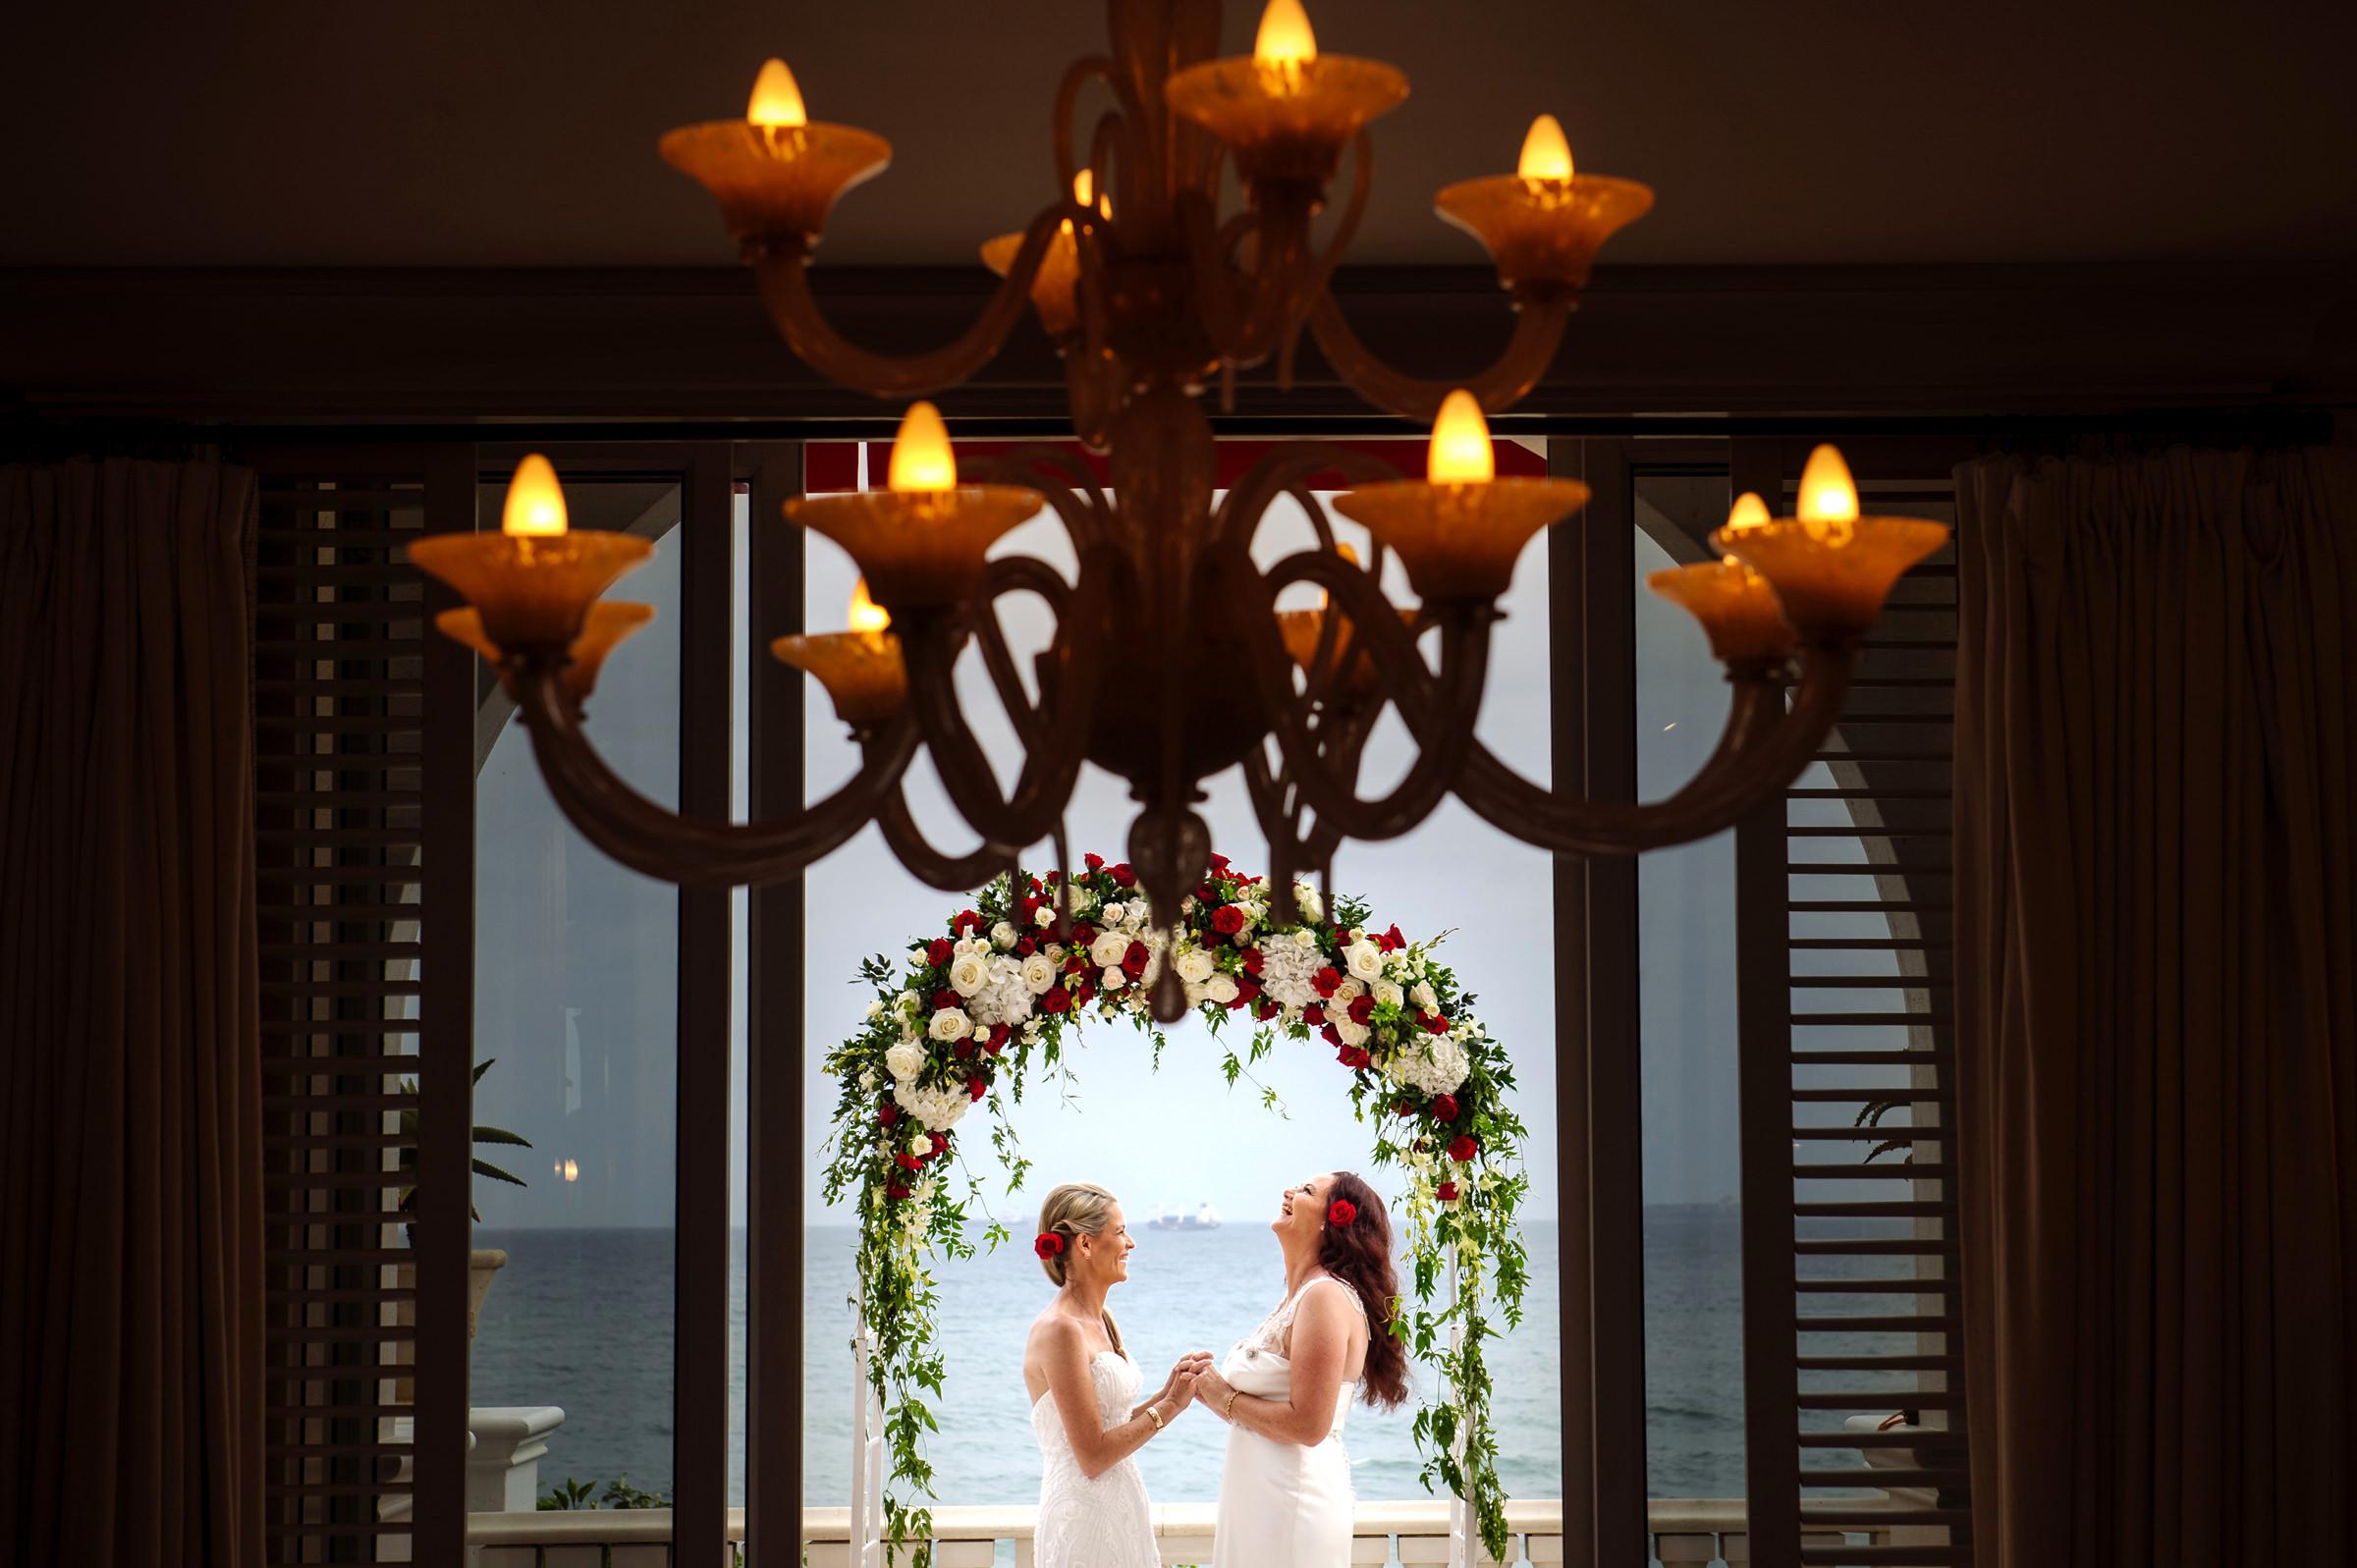 two-brides-celebrate-their-wedding-under-rose-arbor-jacki-bruniquel